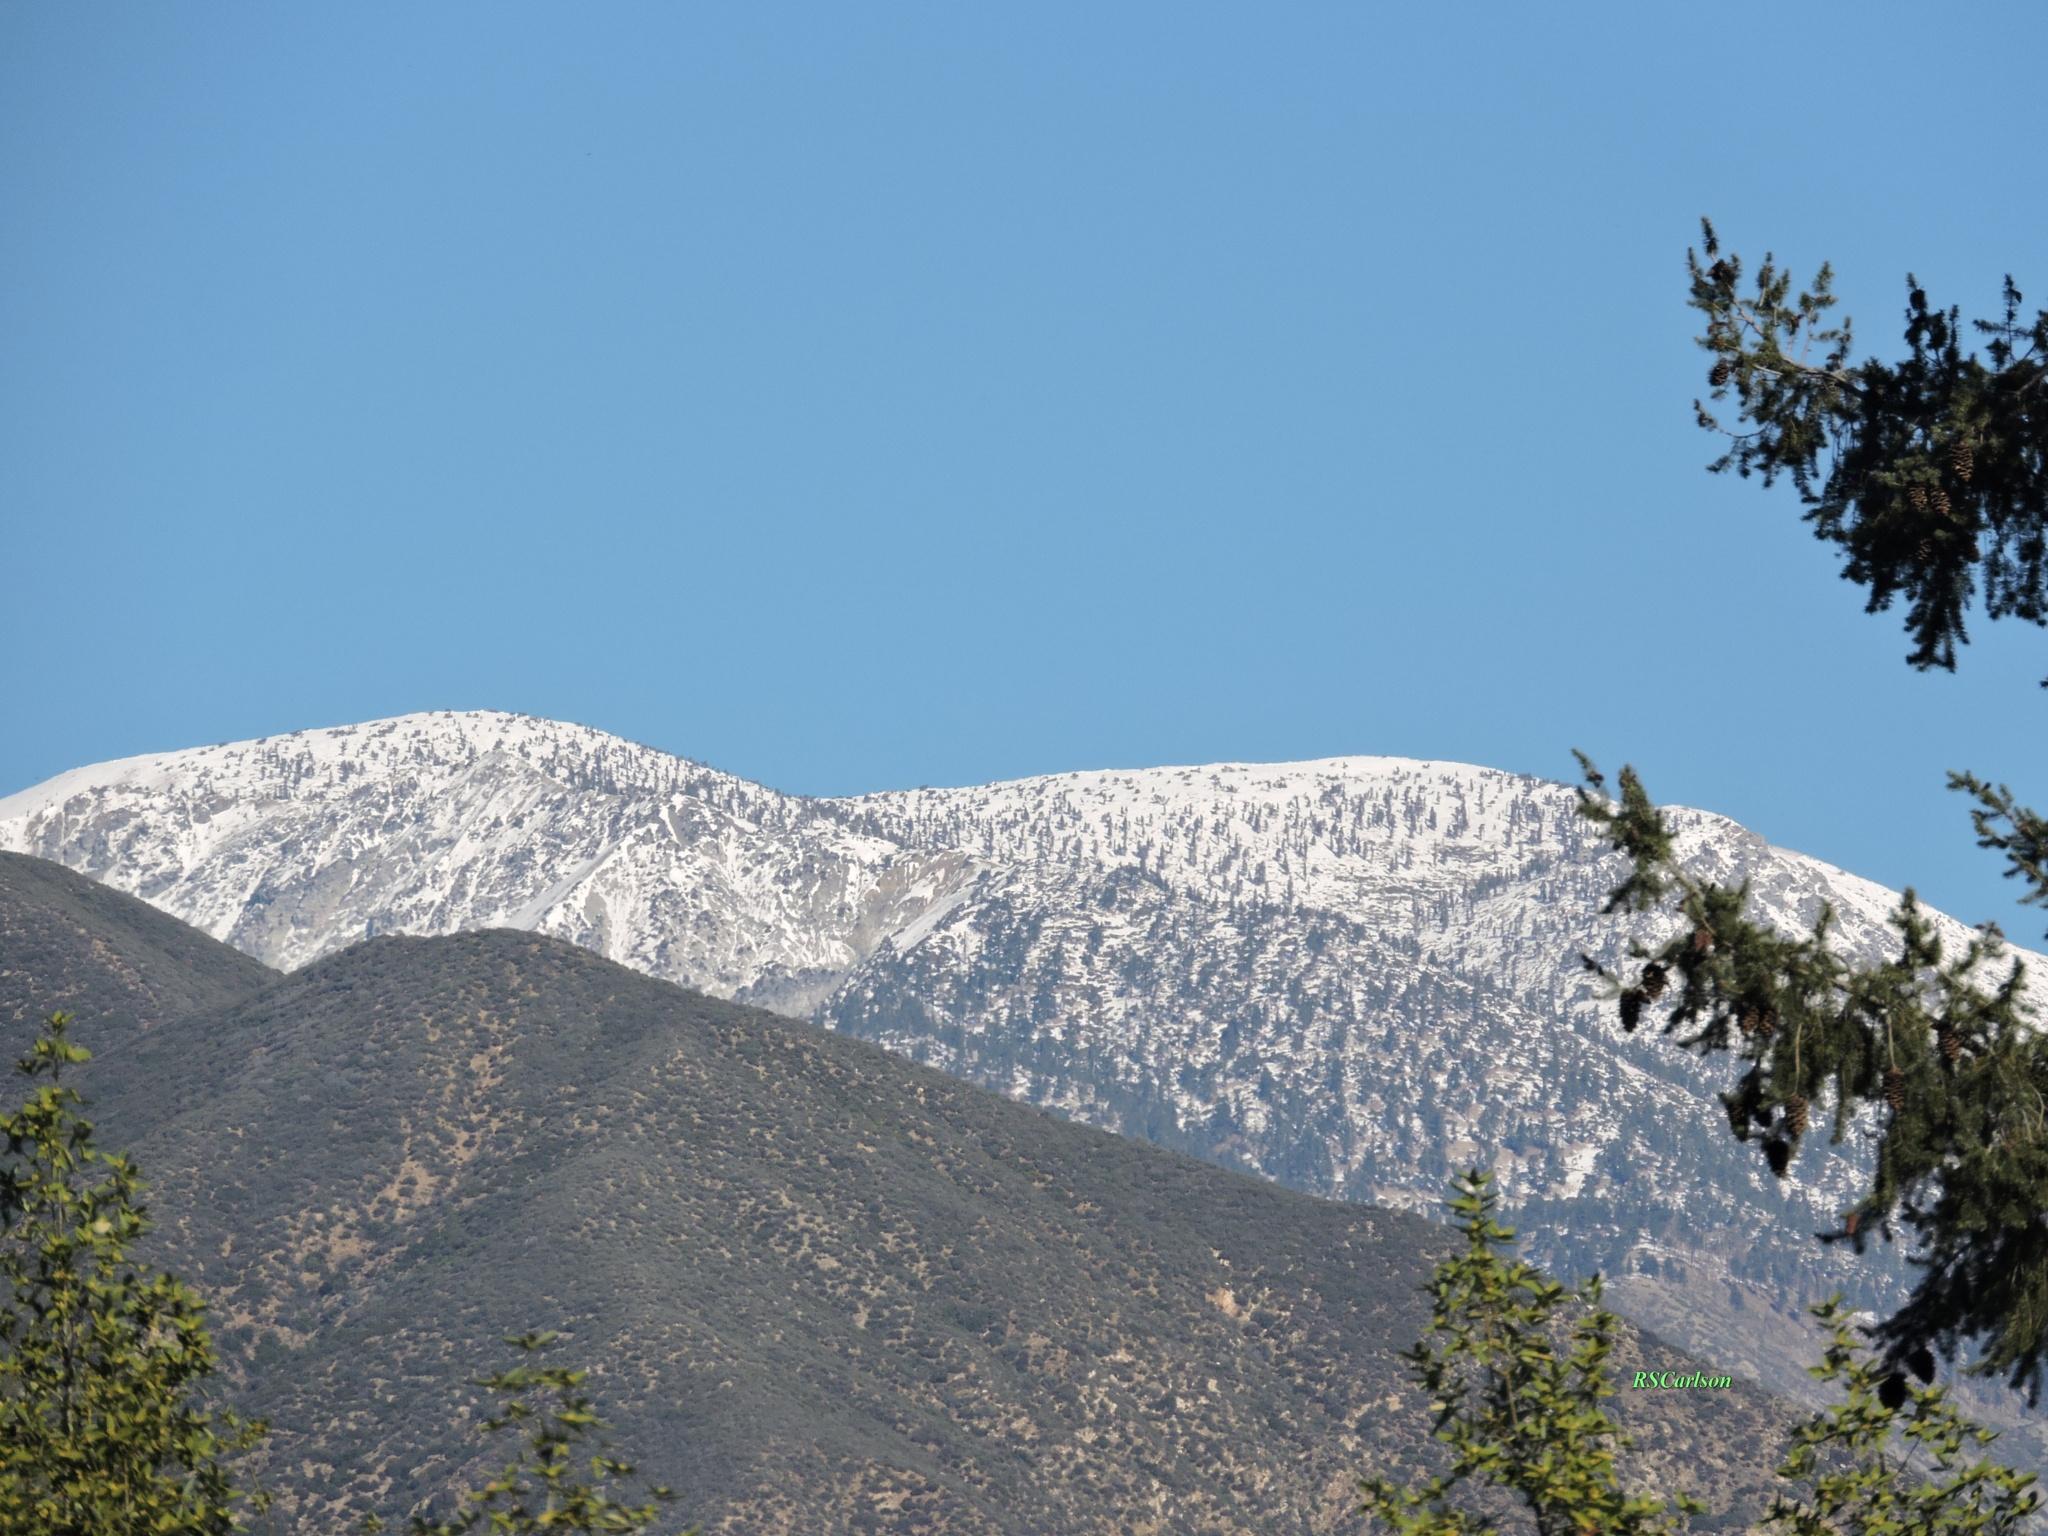 Southern California Snow Tease by ralph.s.carlson